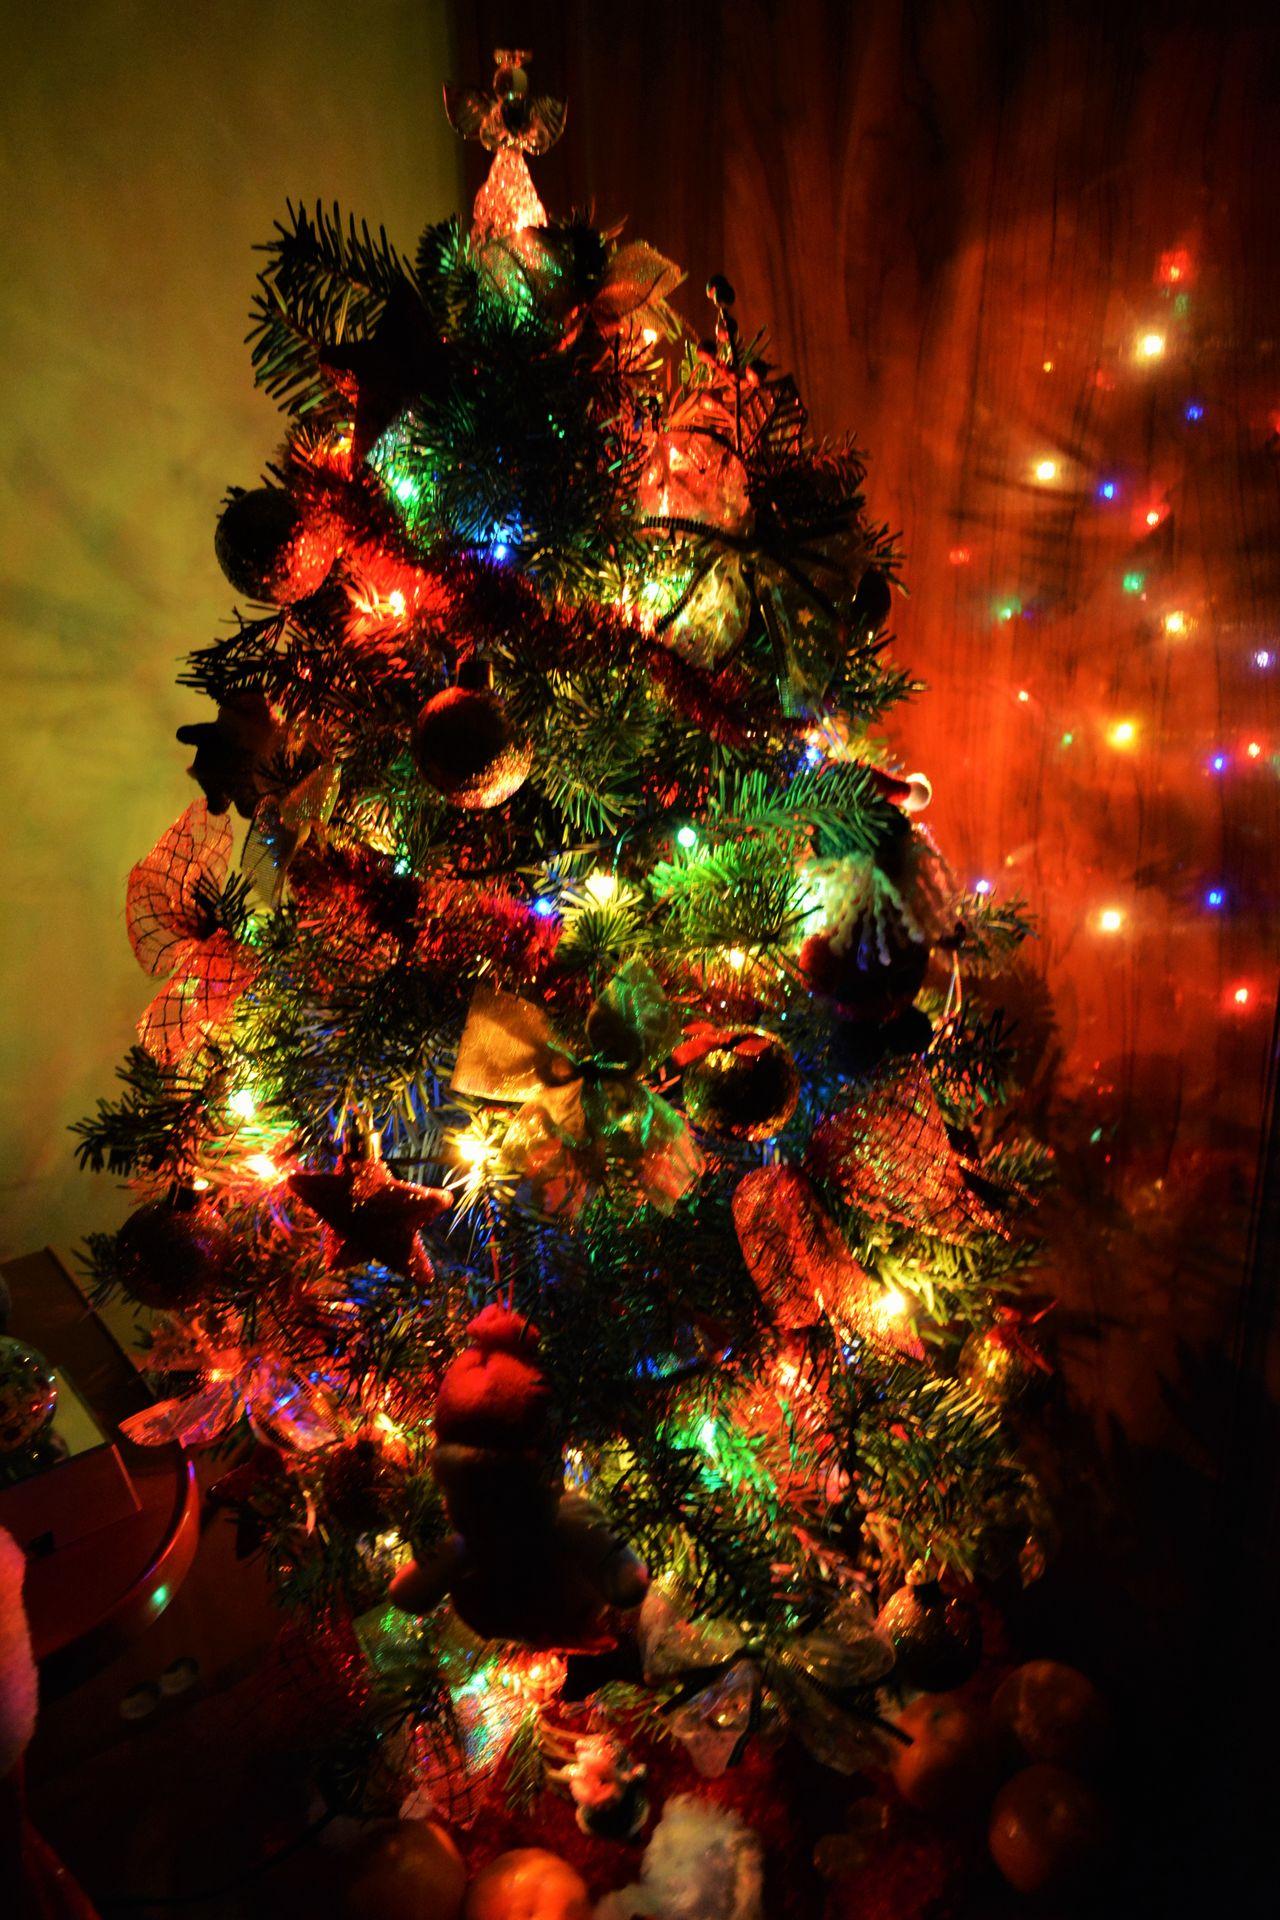 Celebration Celebration Event Christmas Christmas Decoration Christmas Lights Christmas Ornament Christmas Tree Close-up Cultures Decoration Holiday - Event Illuminated Indoors  Night No People Tradition Tree Vacations